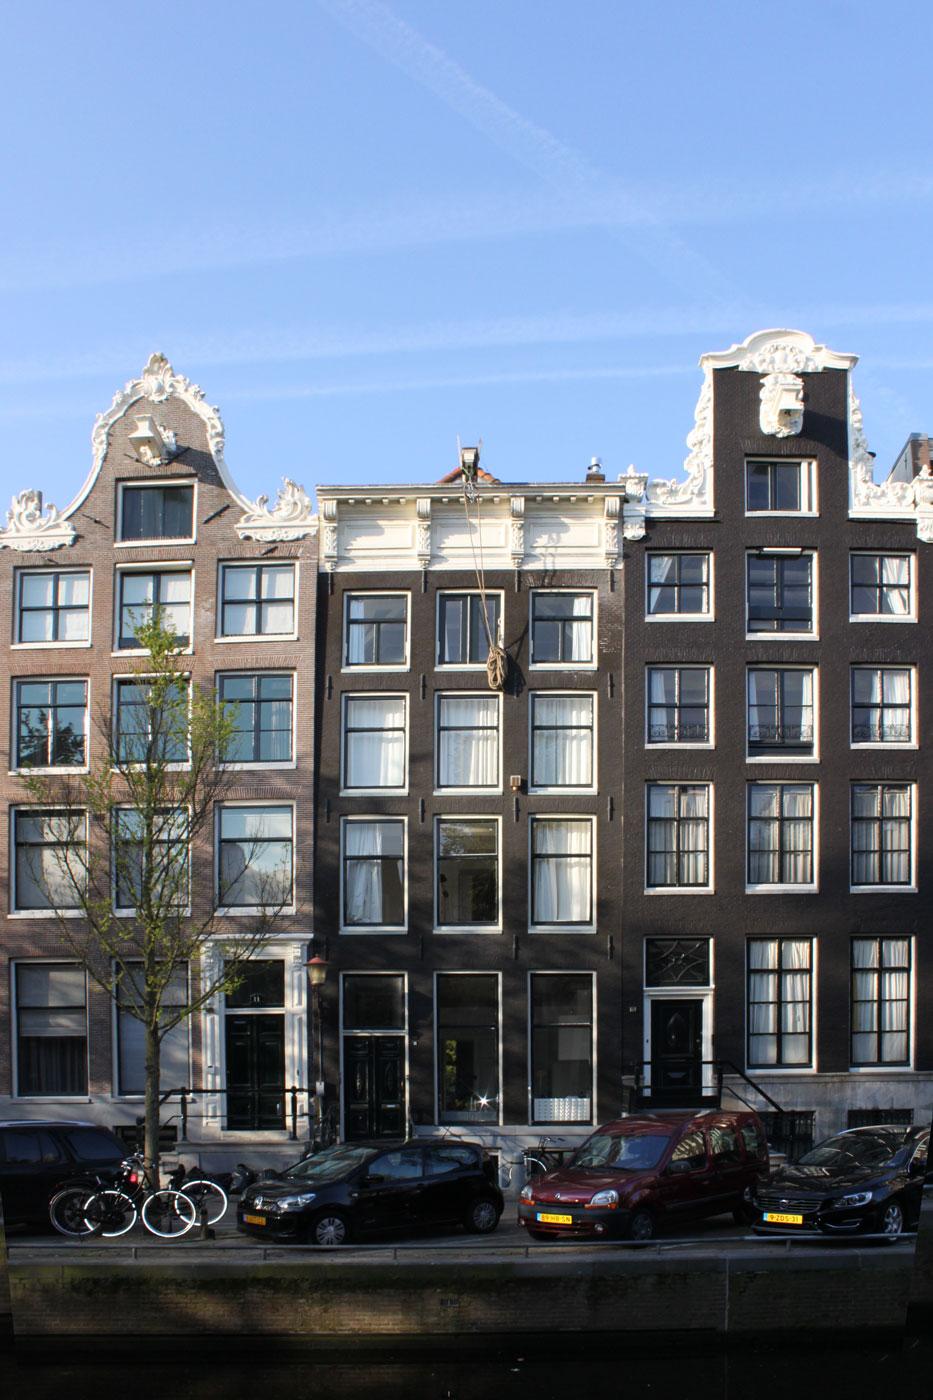 haus leliegracht amsterdam bob gysin partner bgp. Black Bedroom Furniture Sets. Home Design Ideas